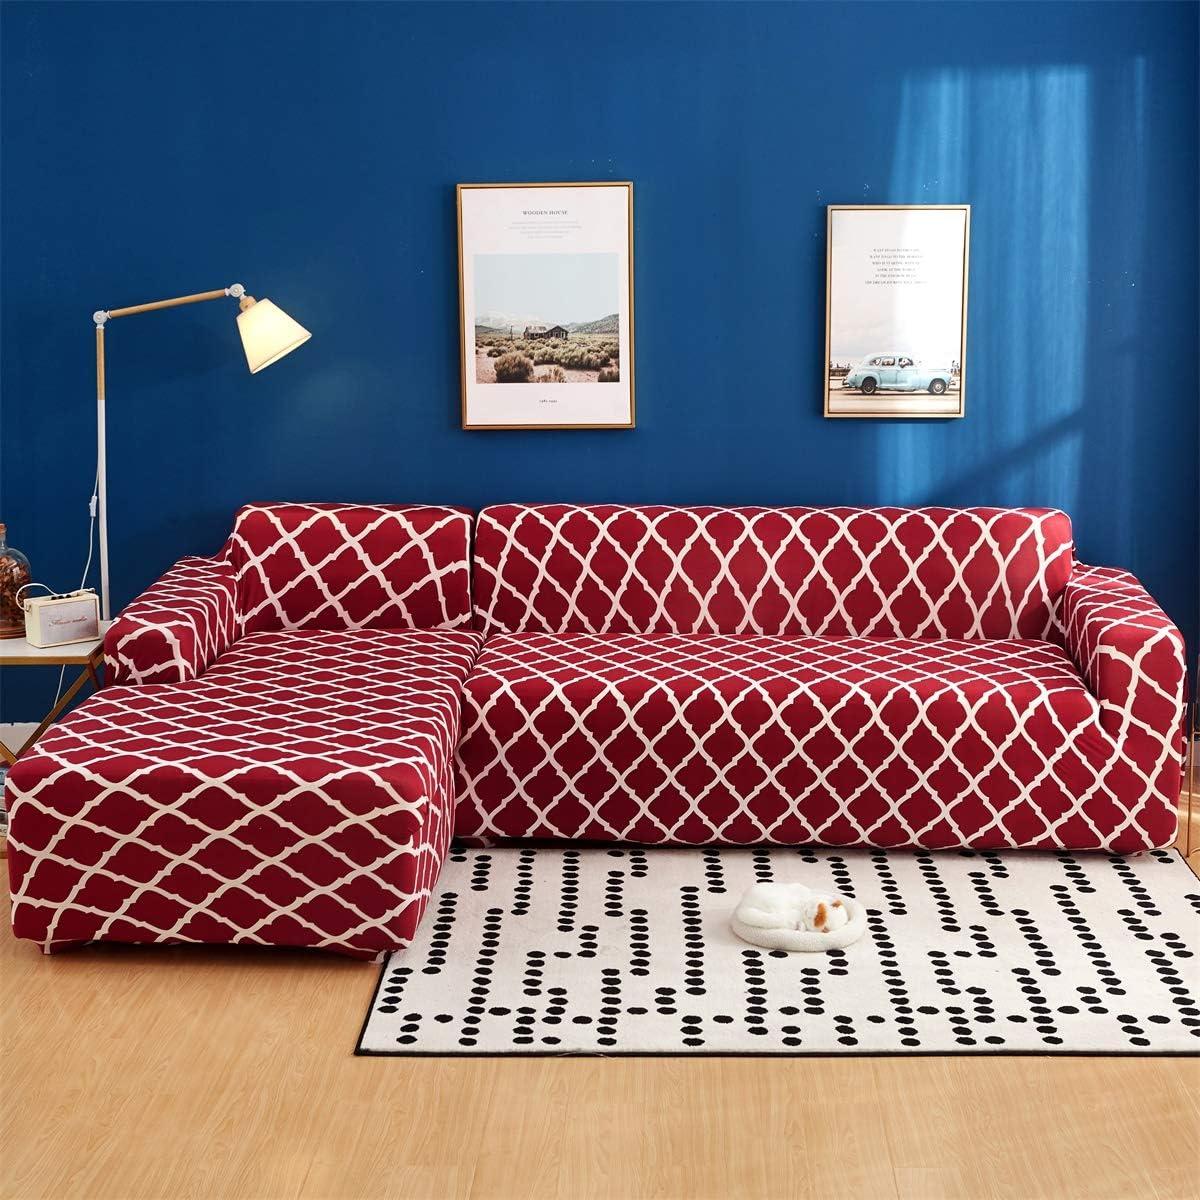 Jian Ya Na L Shape Sofa Covers Sectional Sofa CoverStretch Polyester Spandex Fabric Slipcover 2pcs Stretch Slipcovers 2pcs Pillow Covers L Shape Couch Coffee